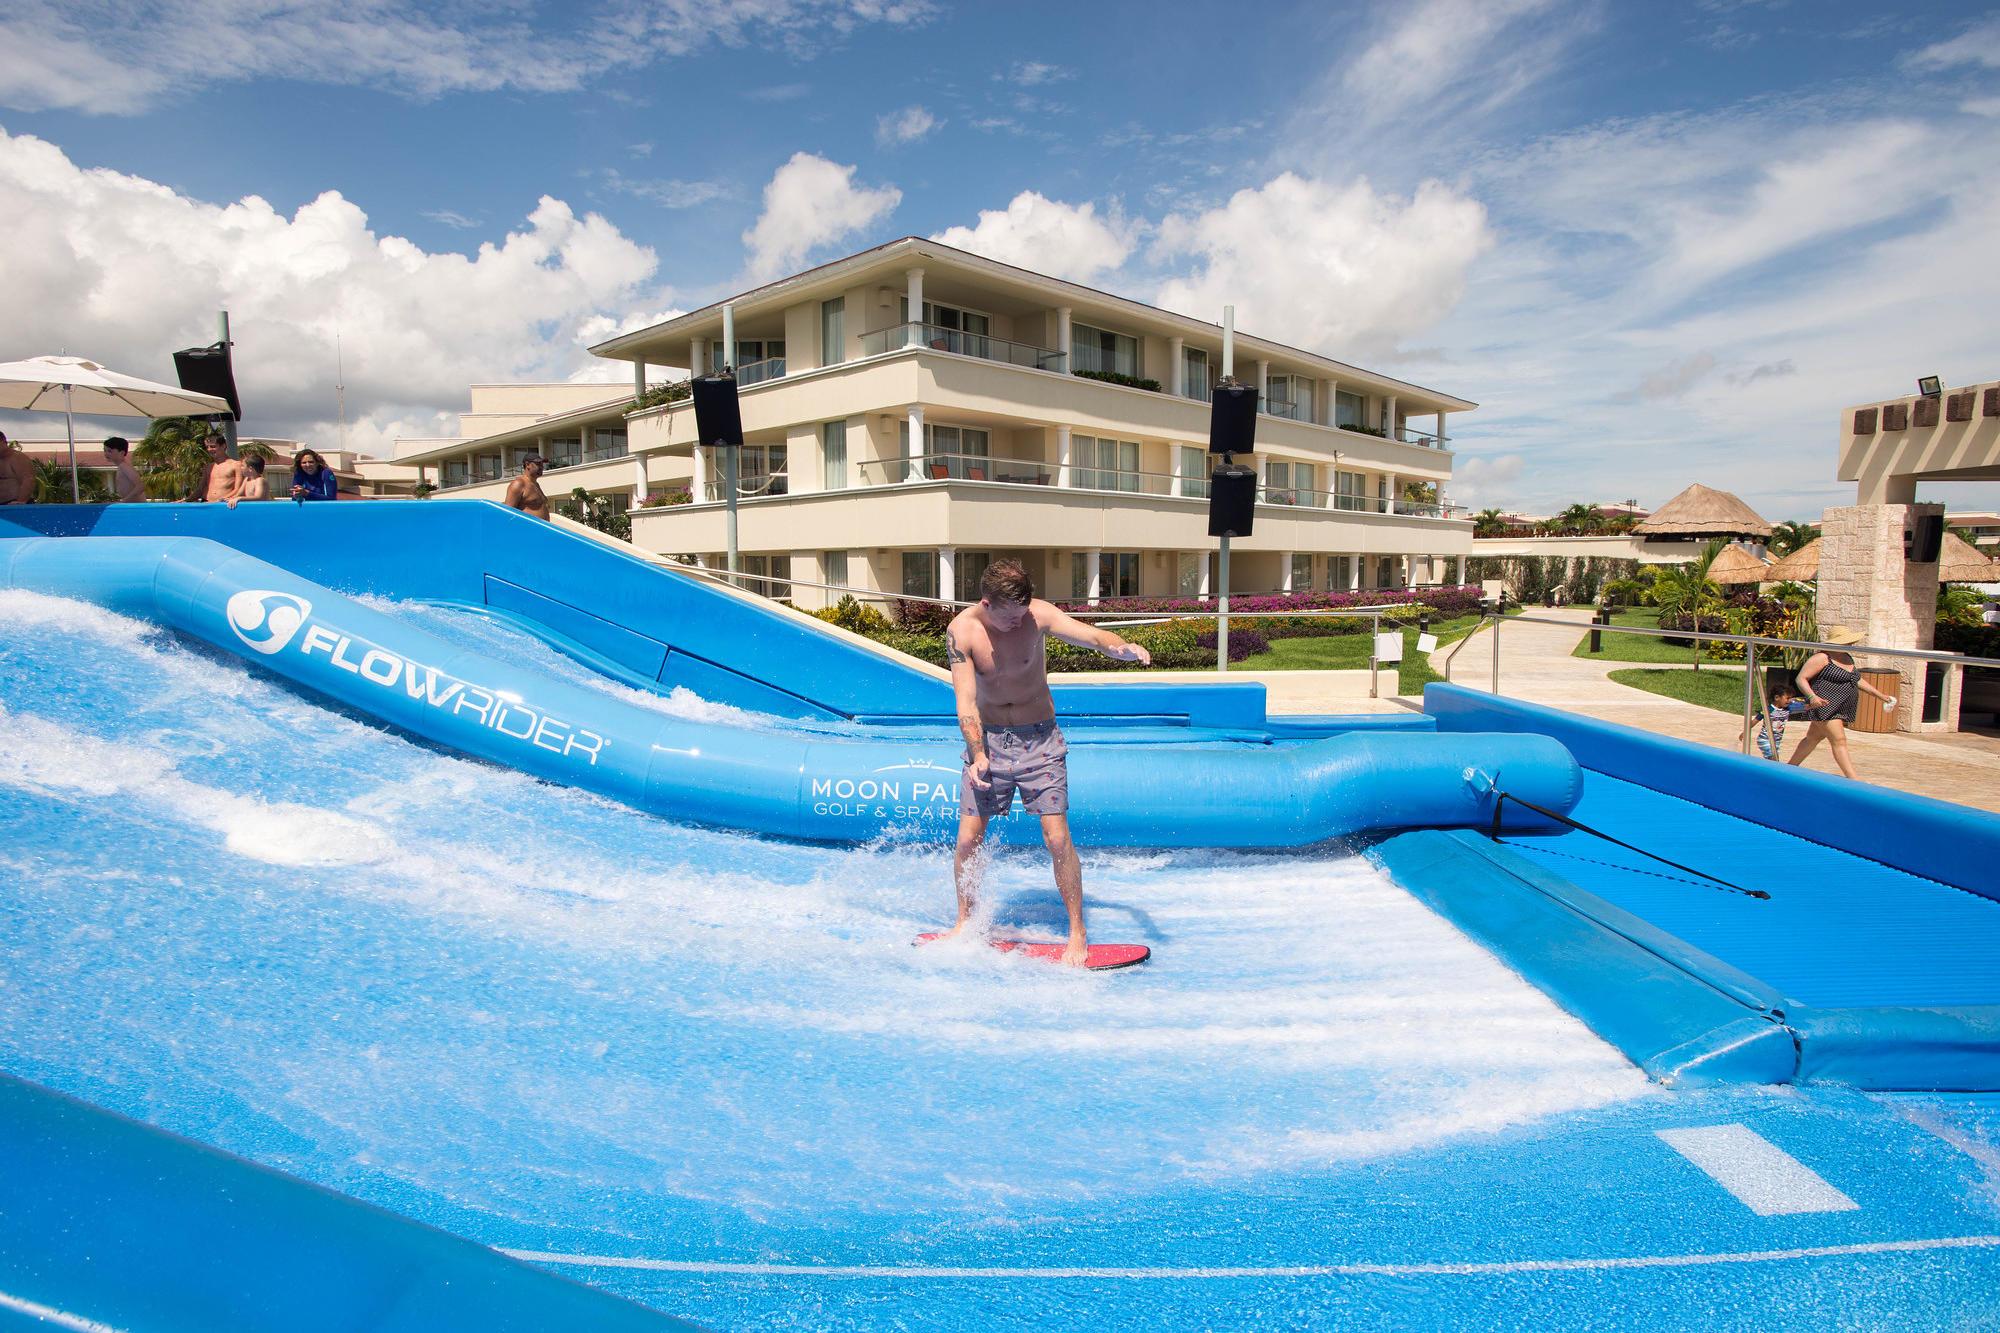 The Flowrider surf simulator at Moon Palace Cancun